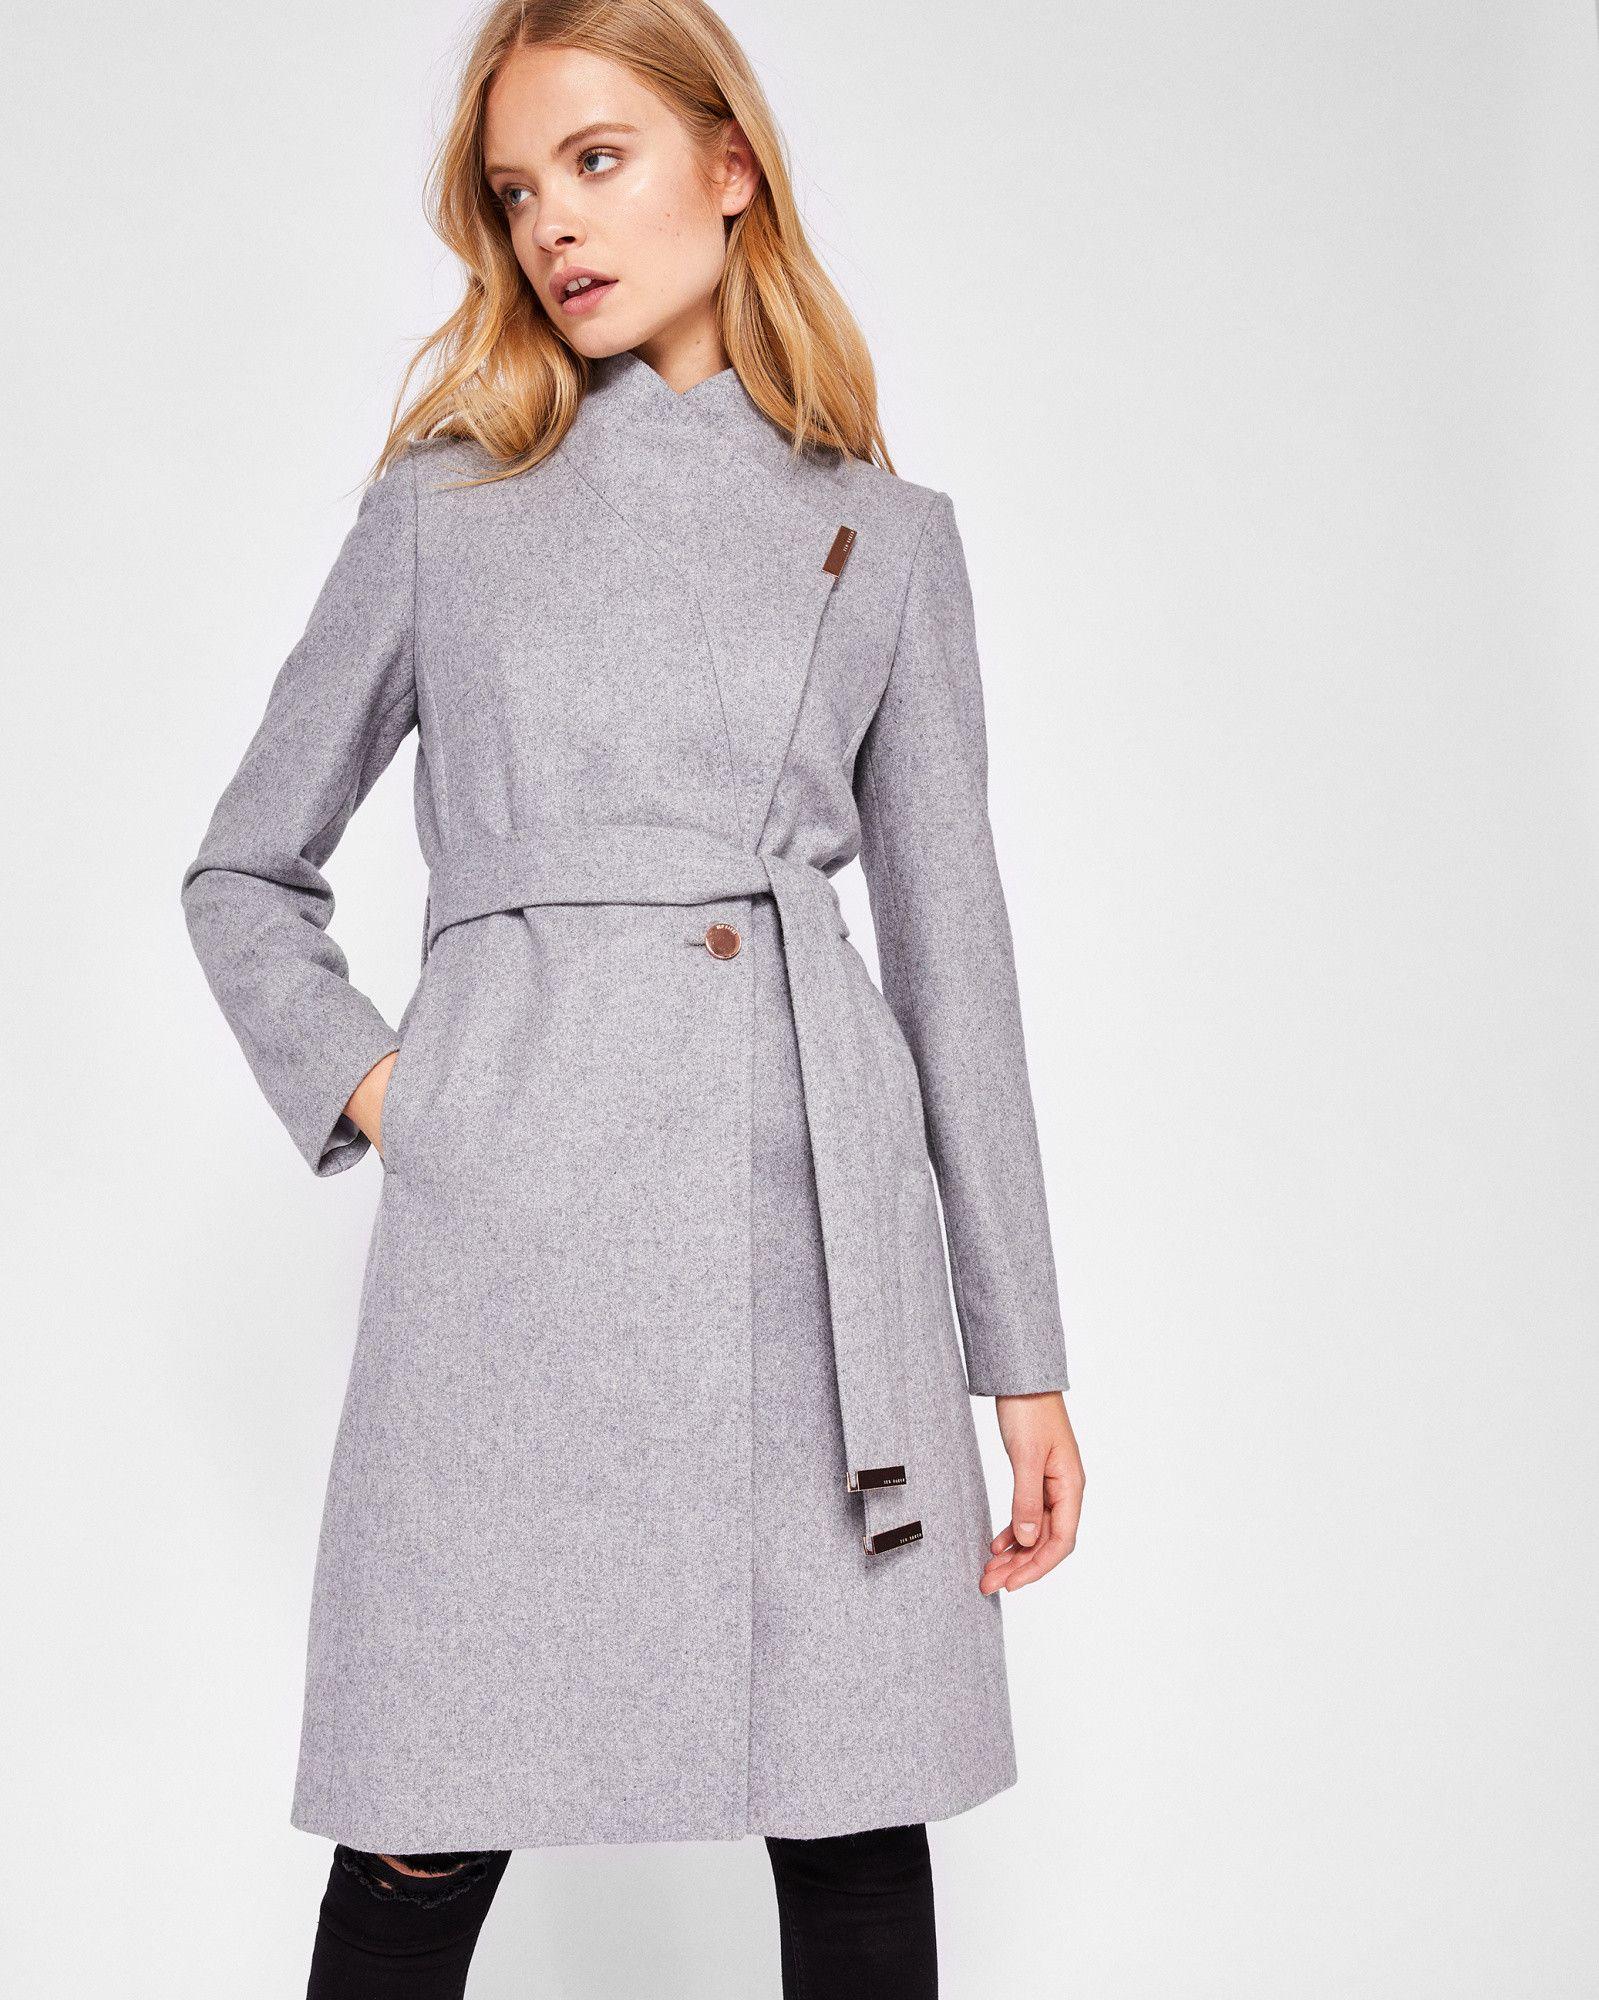 a87e750fef6d KHERA Wool-cashmere wrap coat  TedToToe